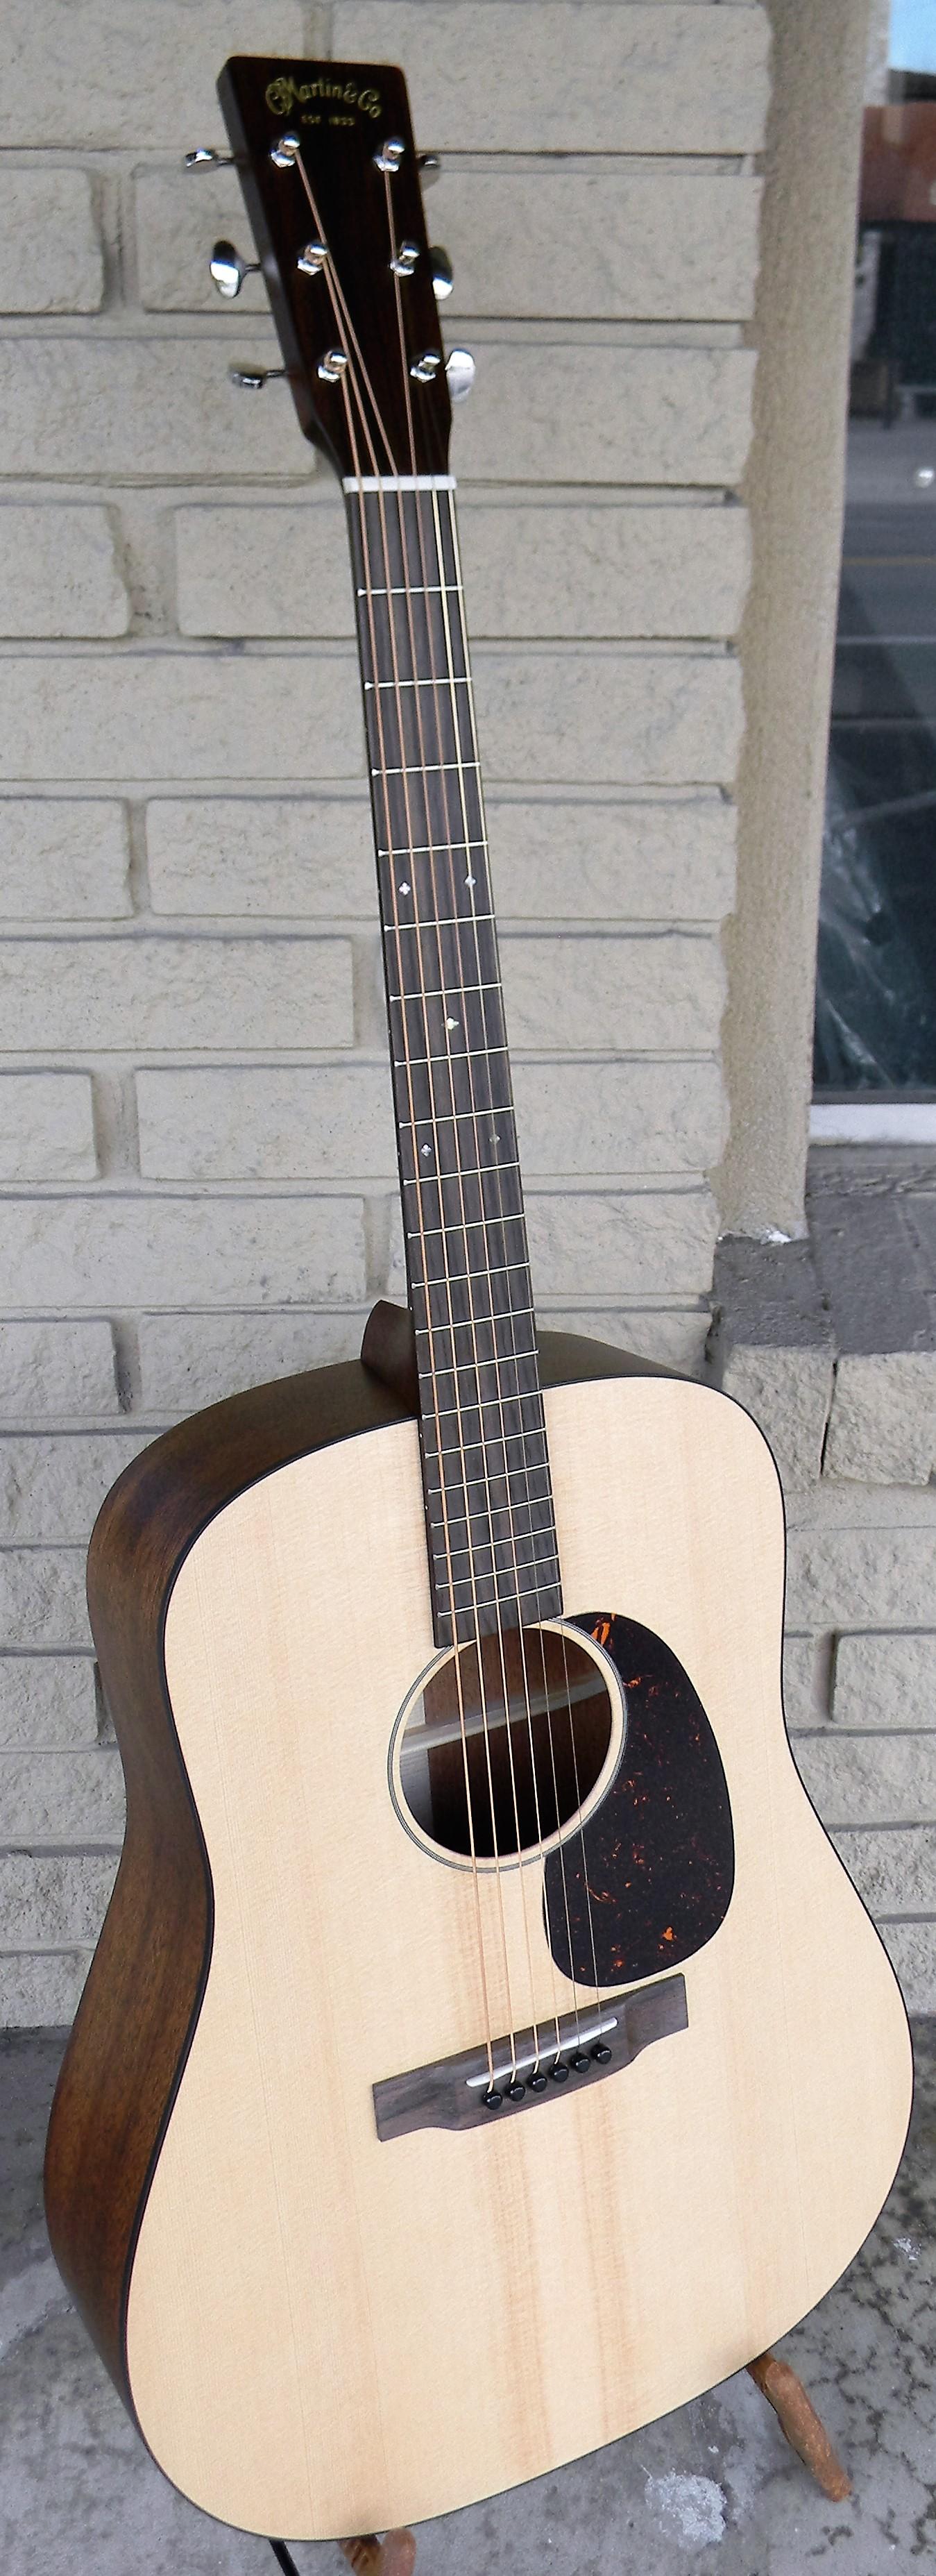 dscn4677 san antonio guitar store guitar tex. Black Bedroom Furniture Sets. Home Design Ideas